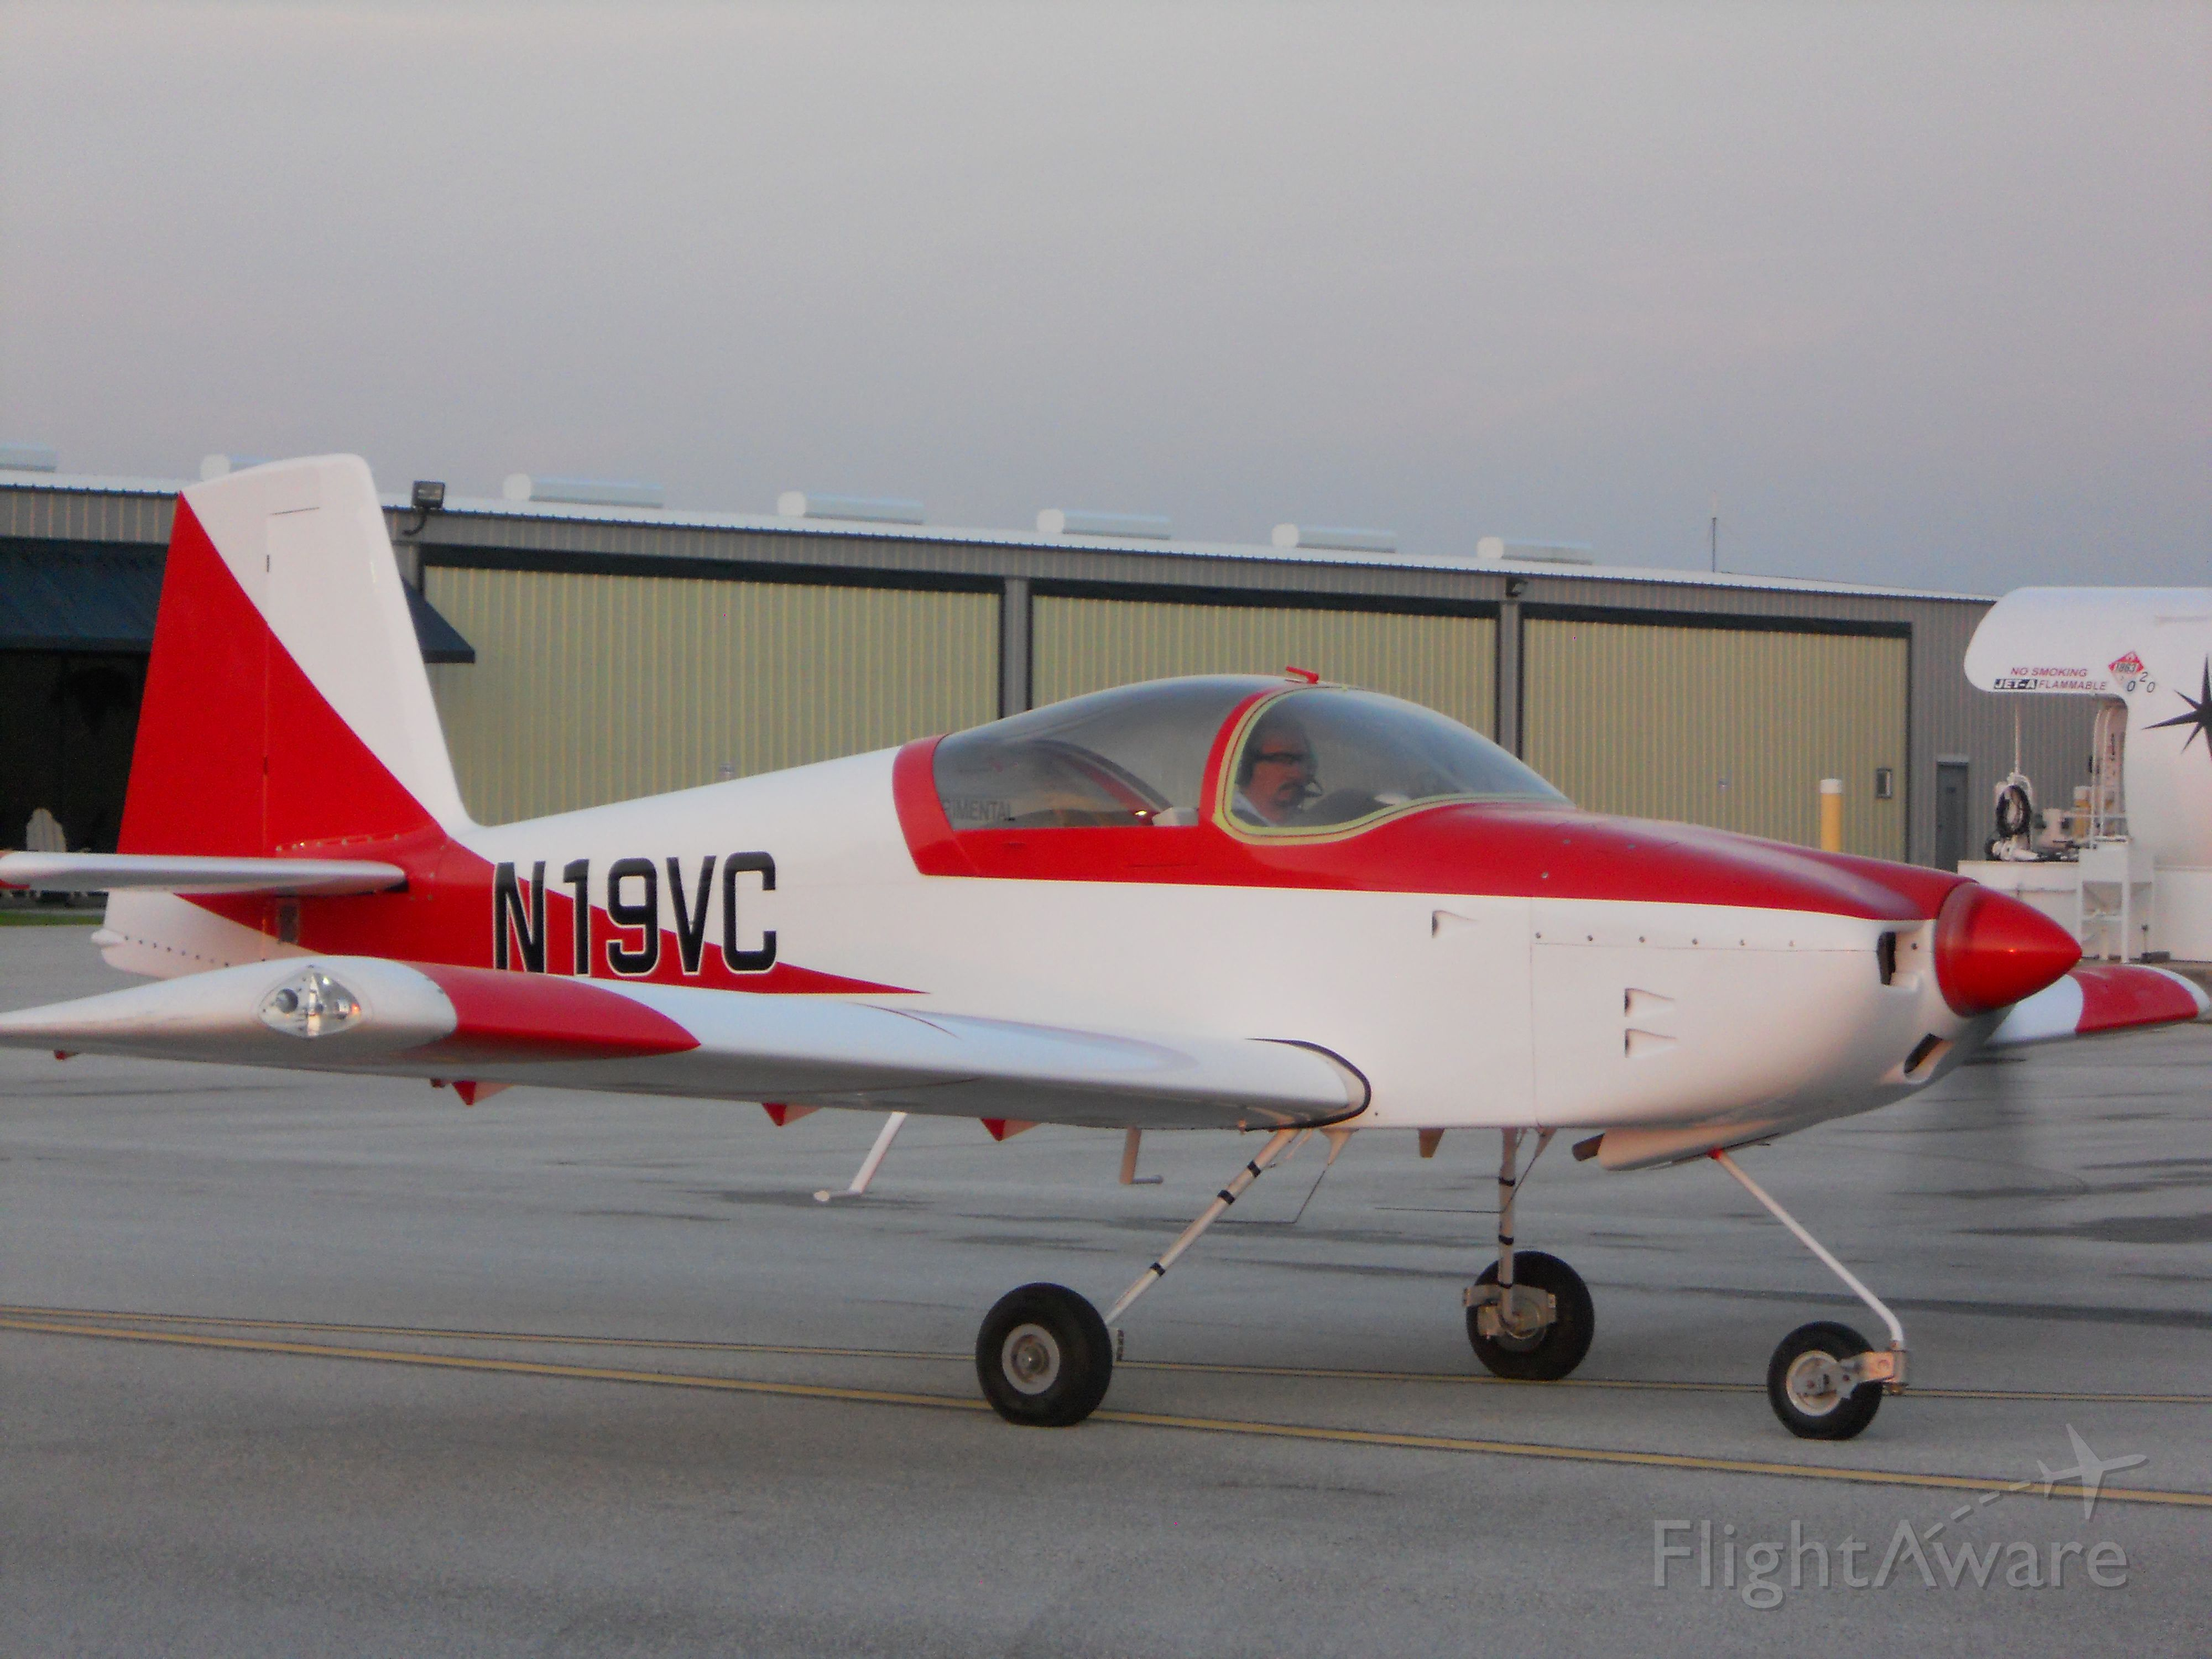 N19VC — - Aug 2, 2011, 7AM, First Flight foto